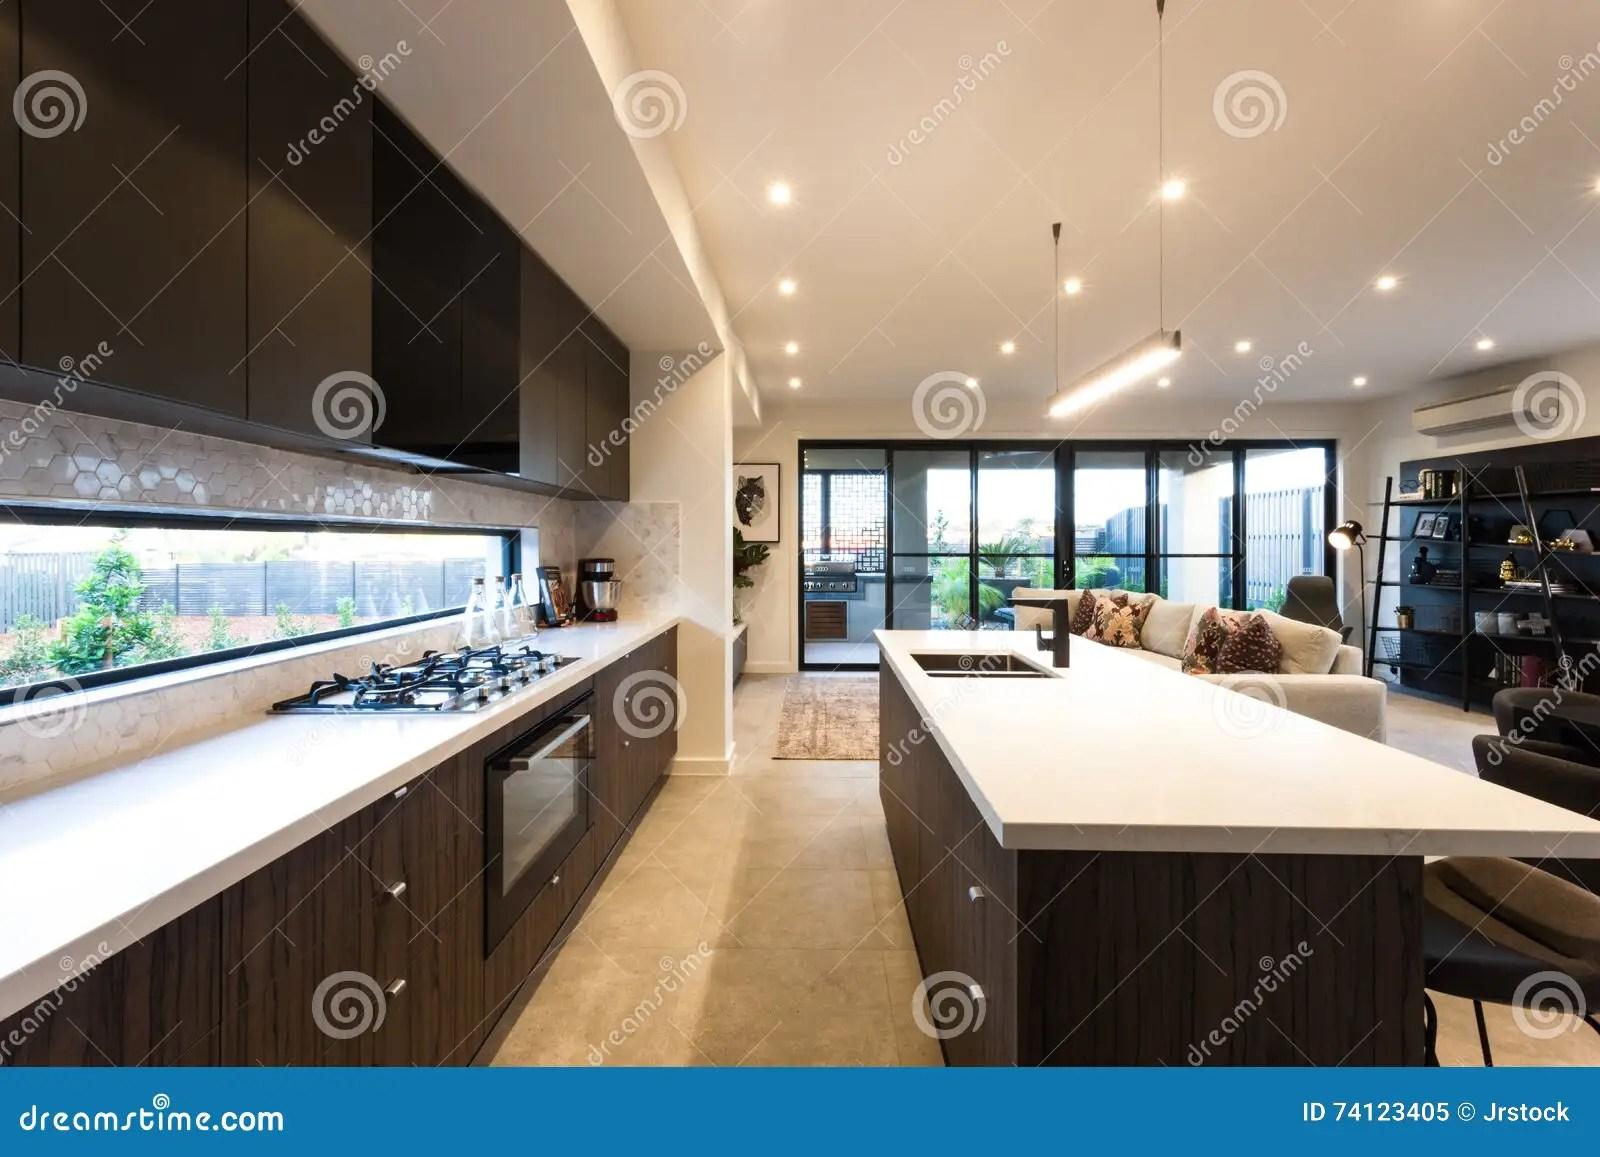 modern kitchen light towels 现代厨房照亮与云幂灯在天时间库存图片 图片包括有架子 室内 房子 现代厨房照亮与云幂灯在天时间